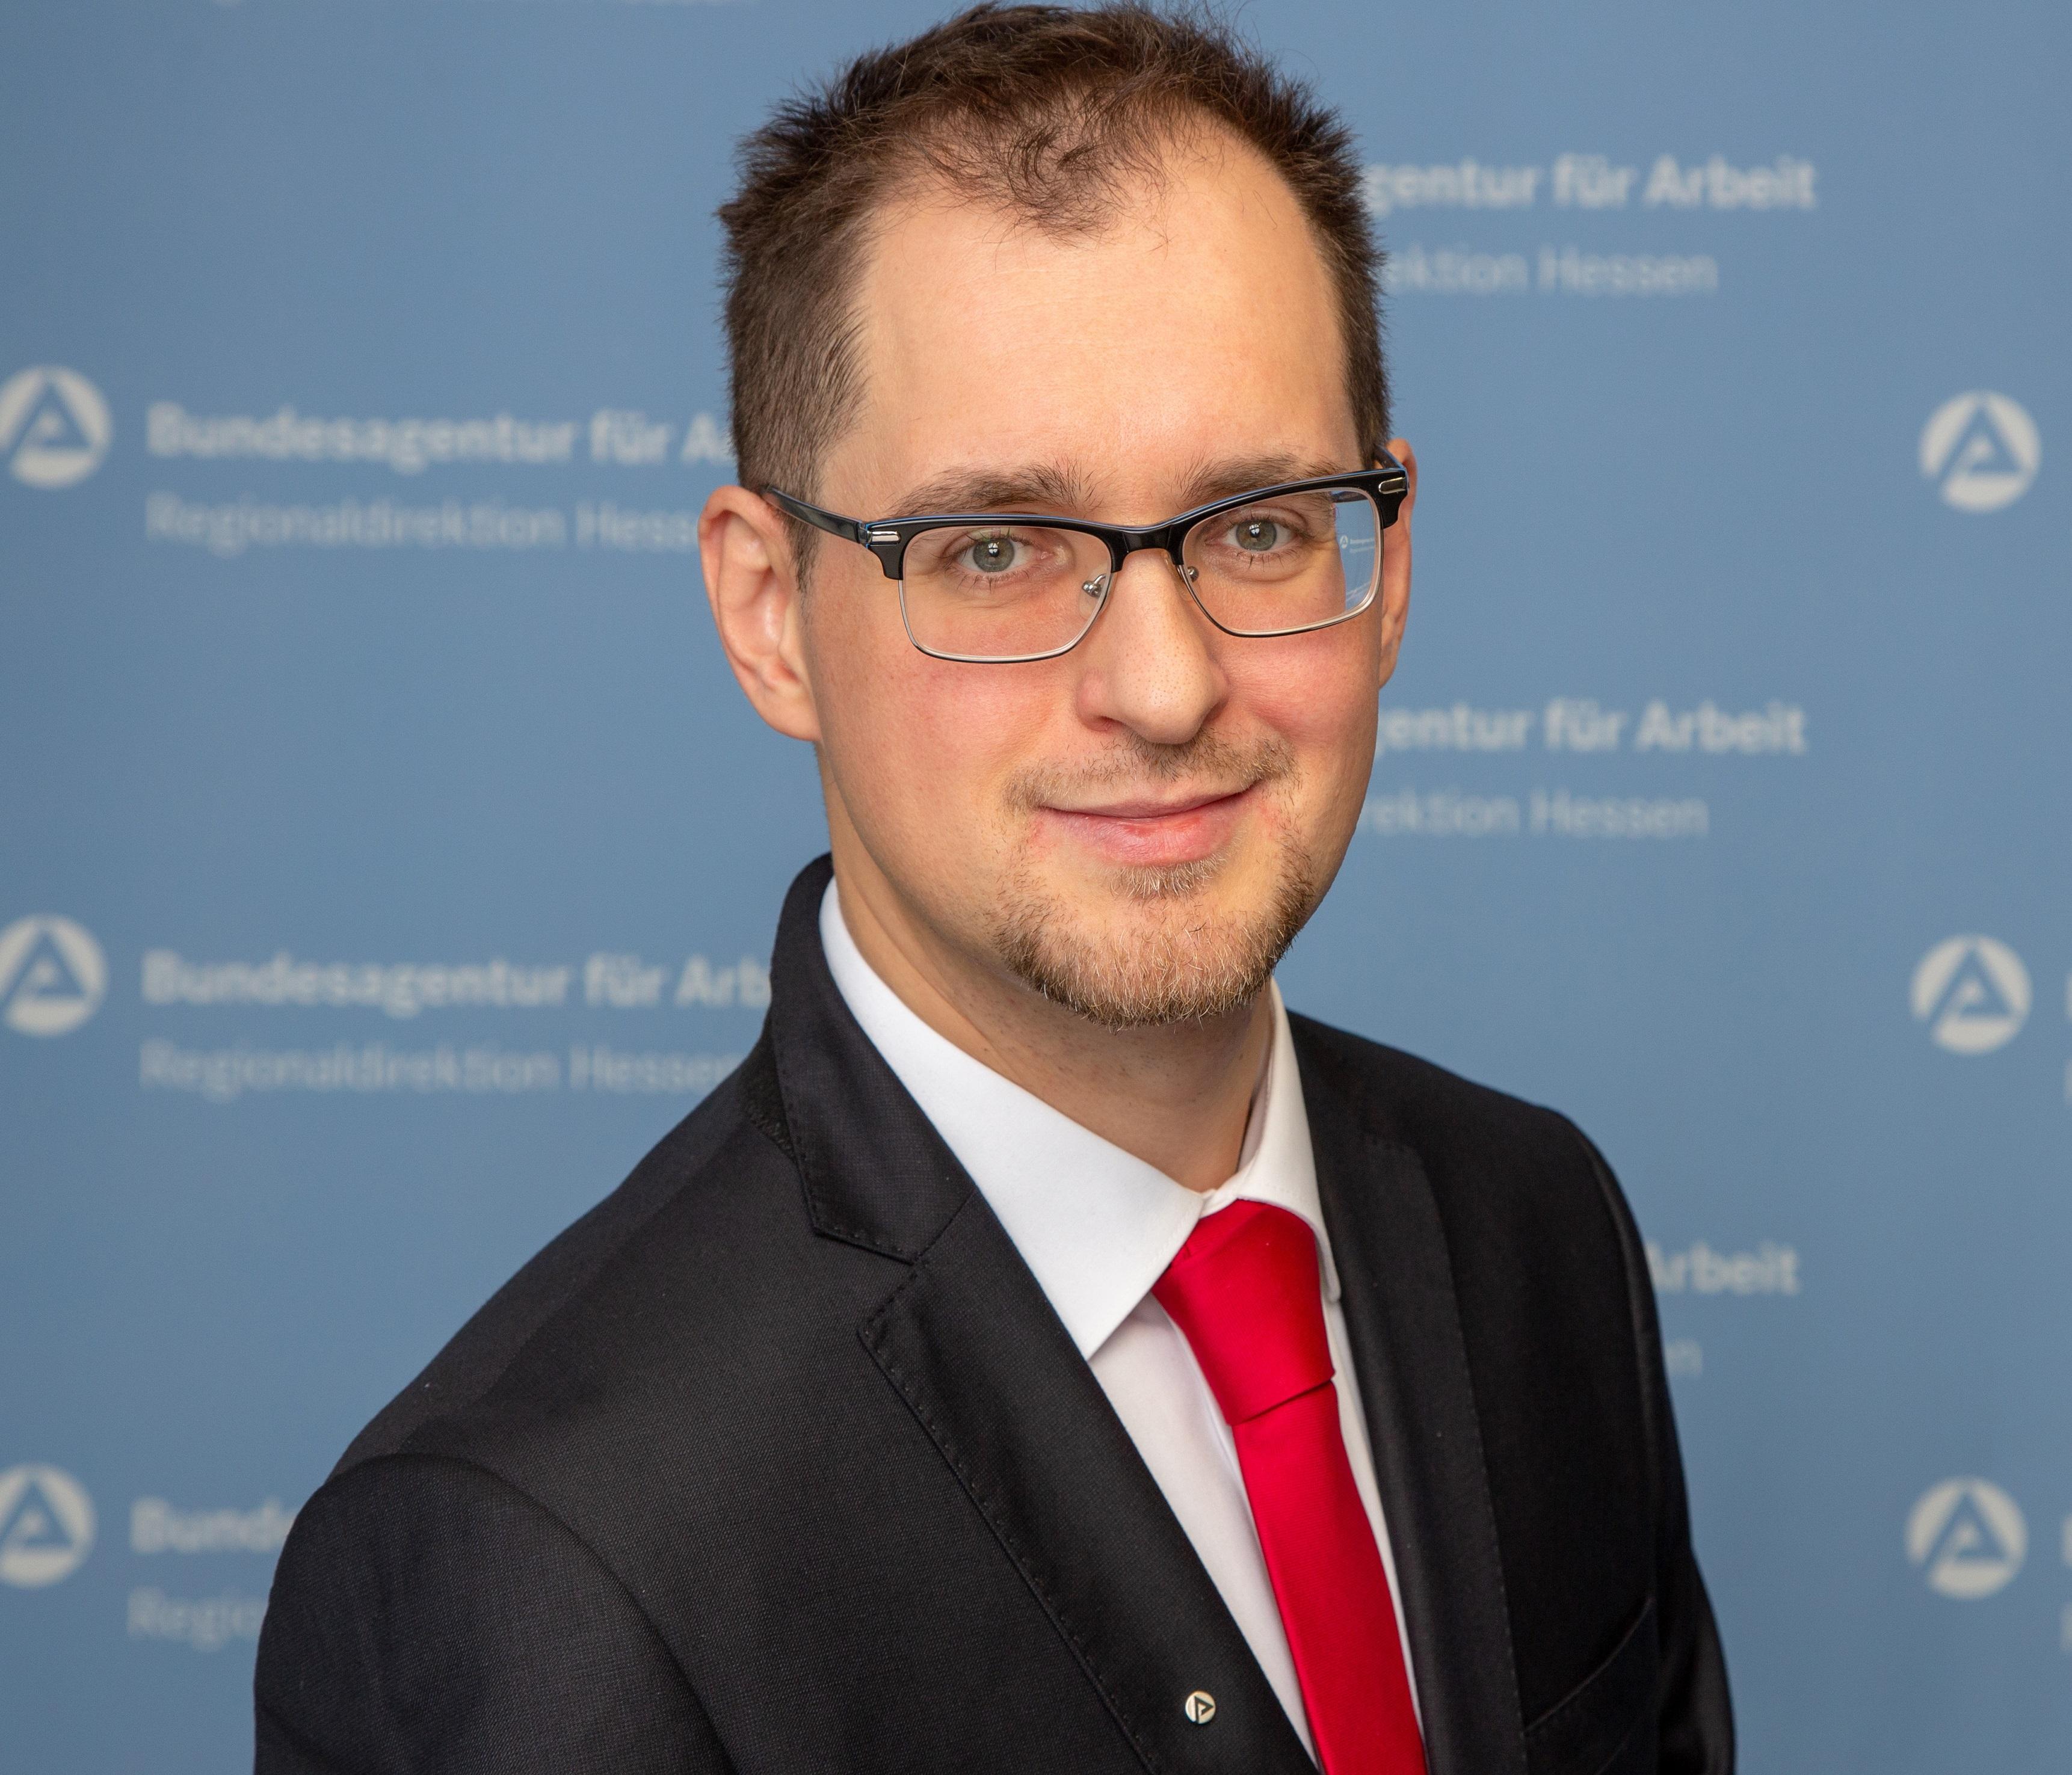 Frederik André Marohn